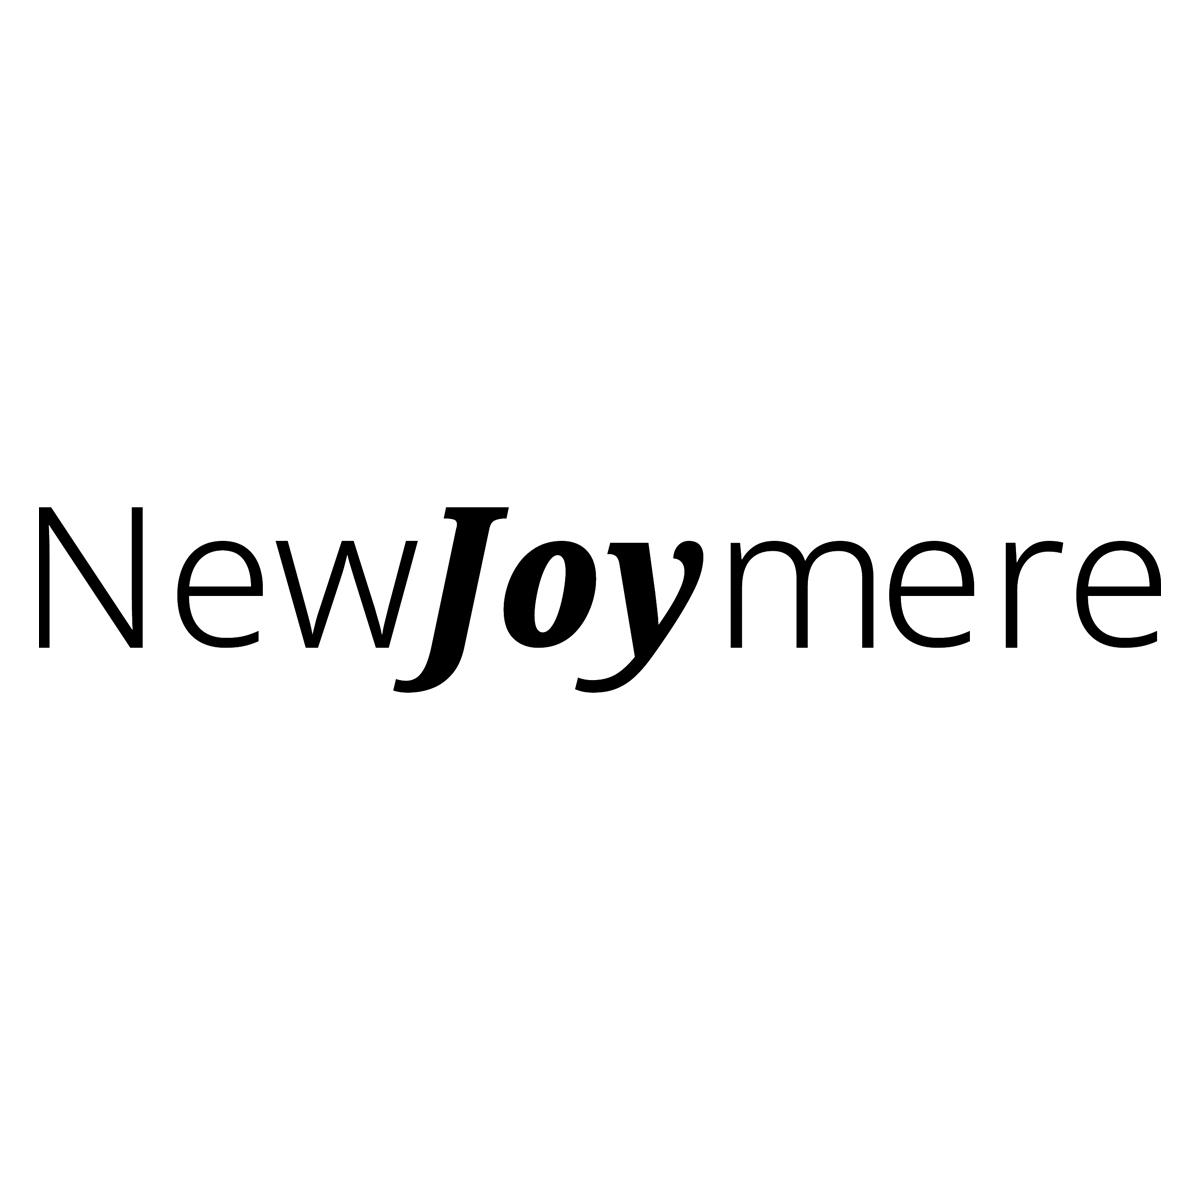 NewJoymere